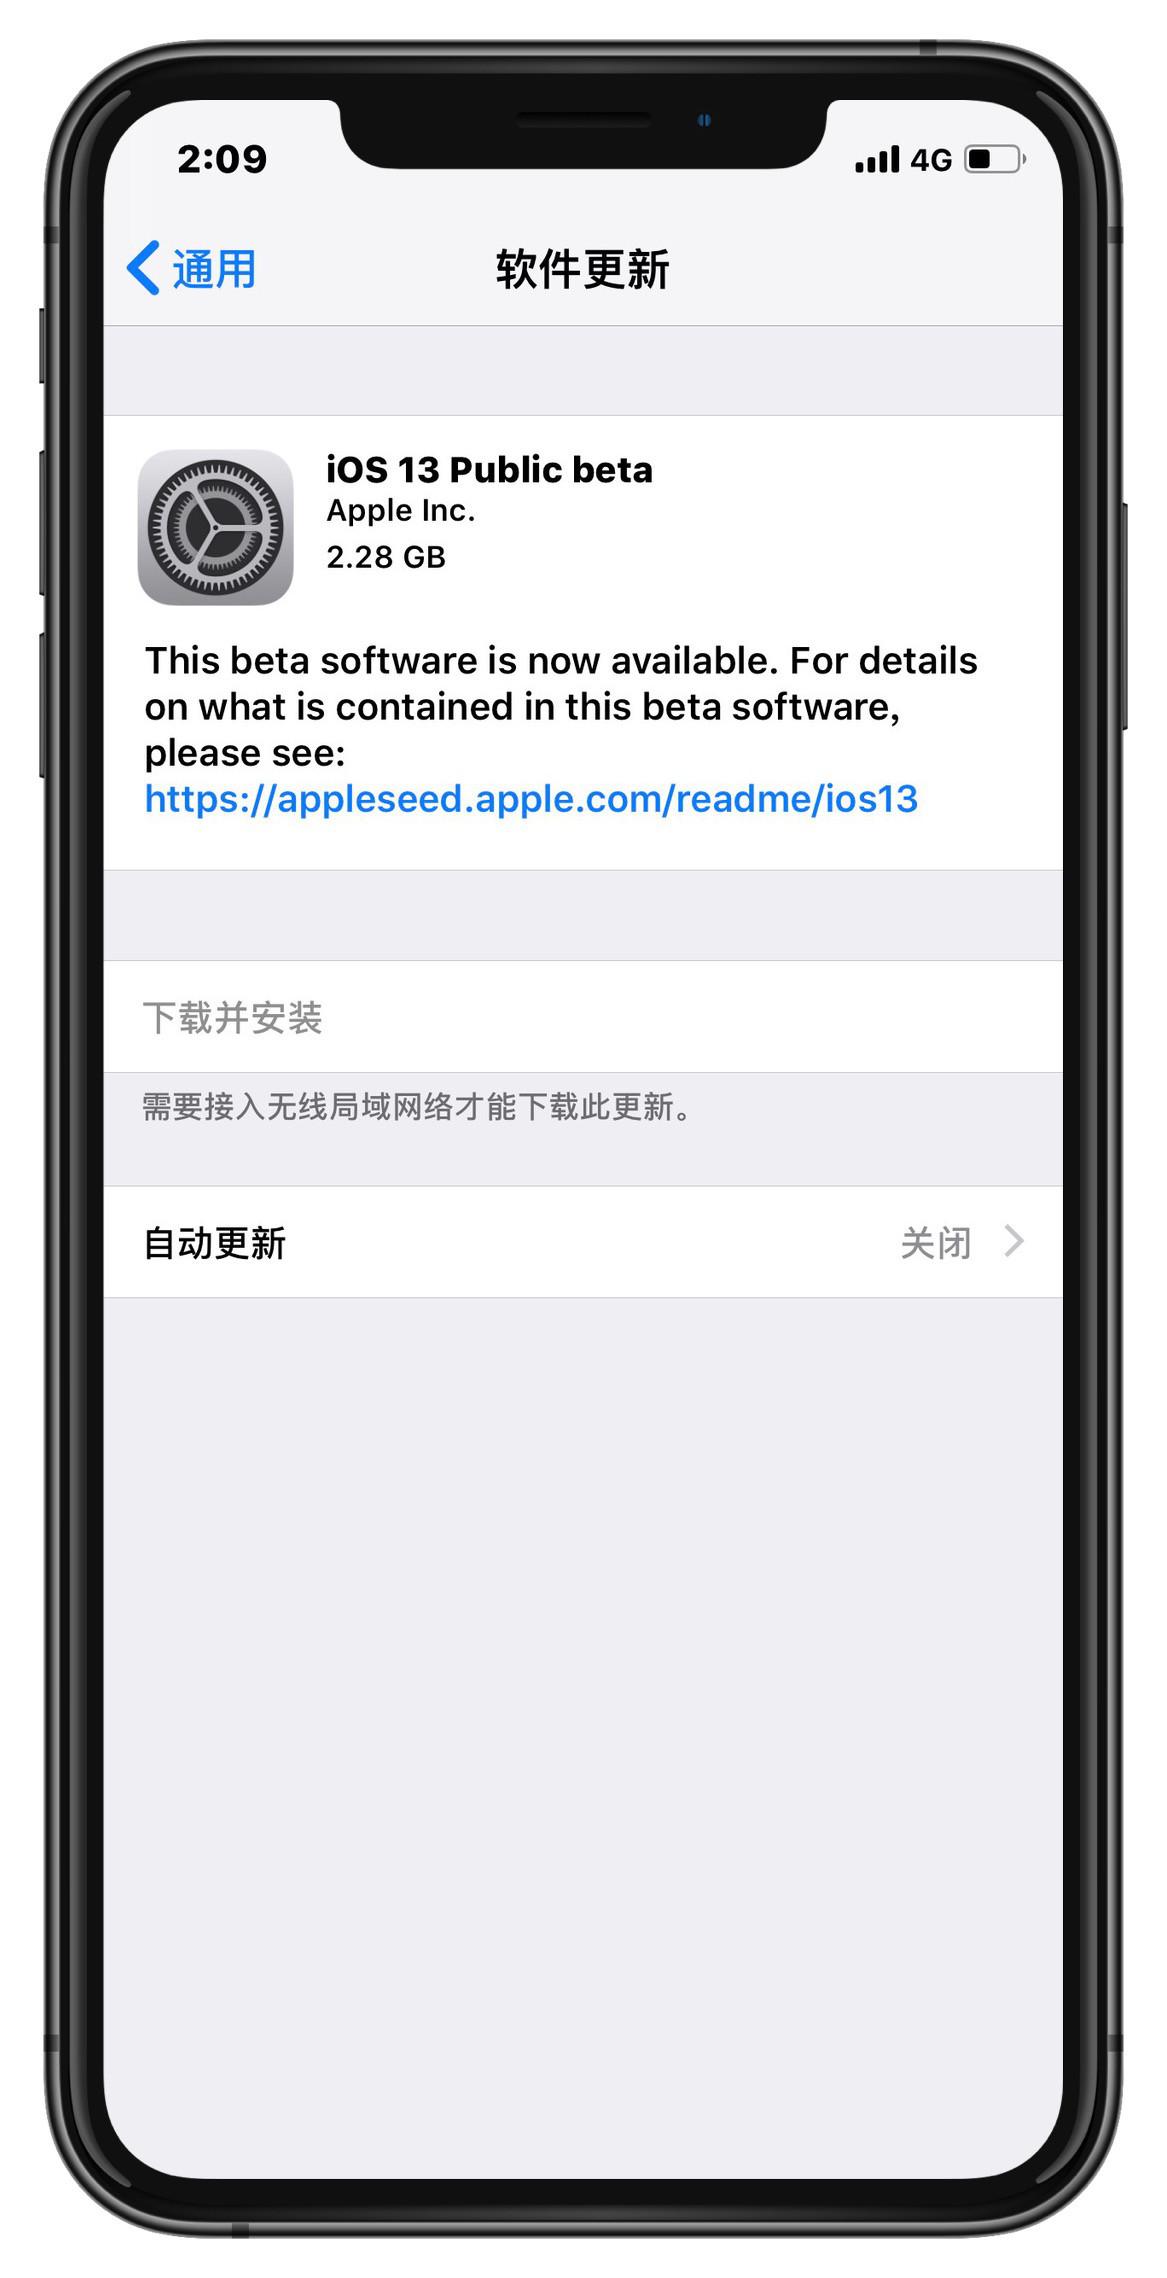 iOS 13 首个公测版和开发者内测 Beta2 有什么区别?